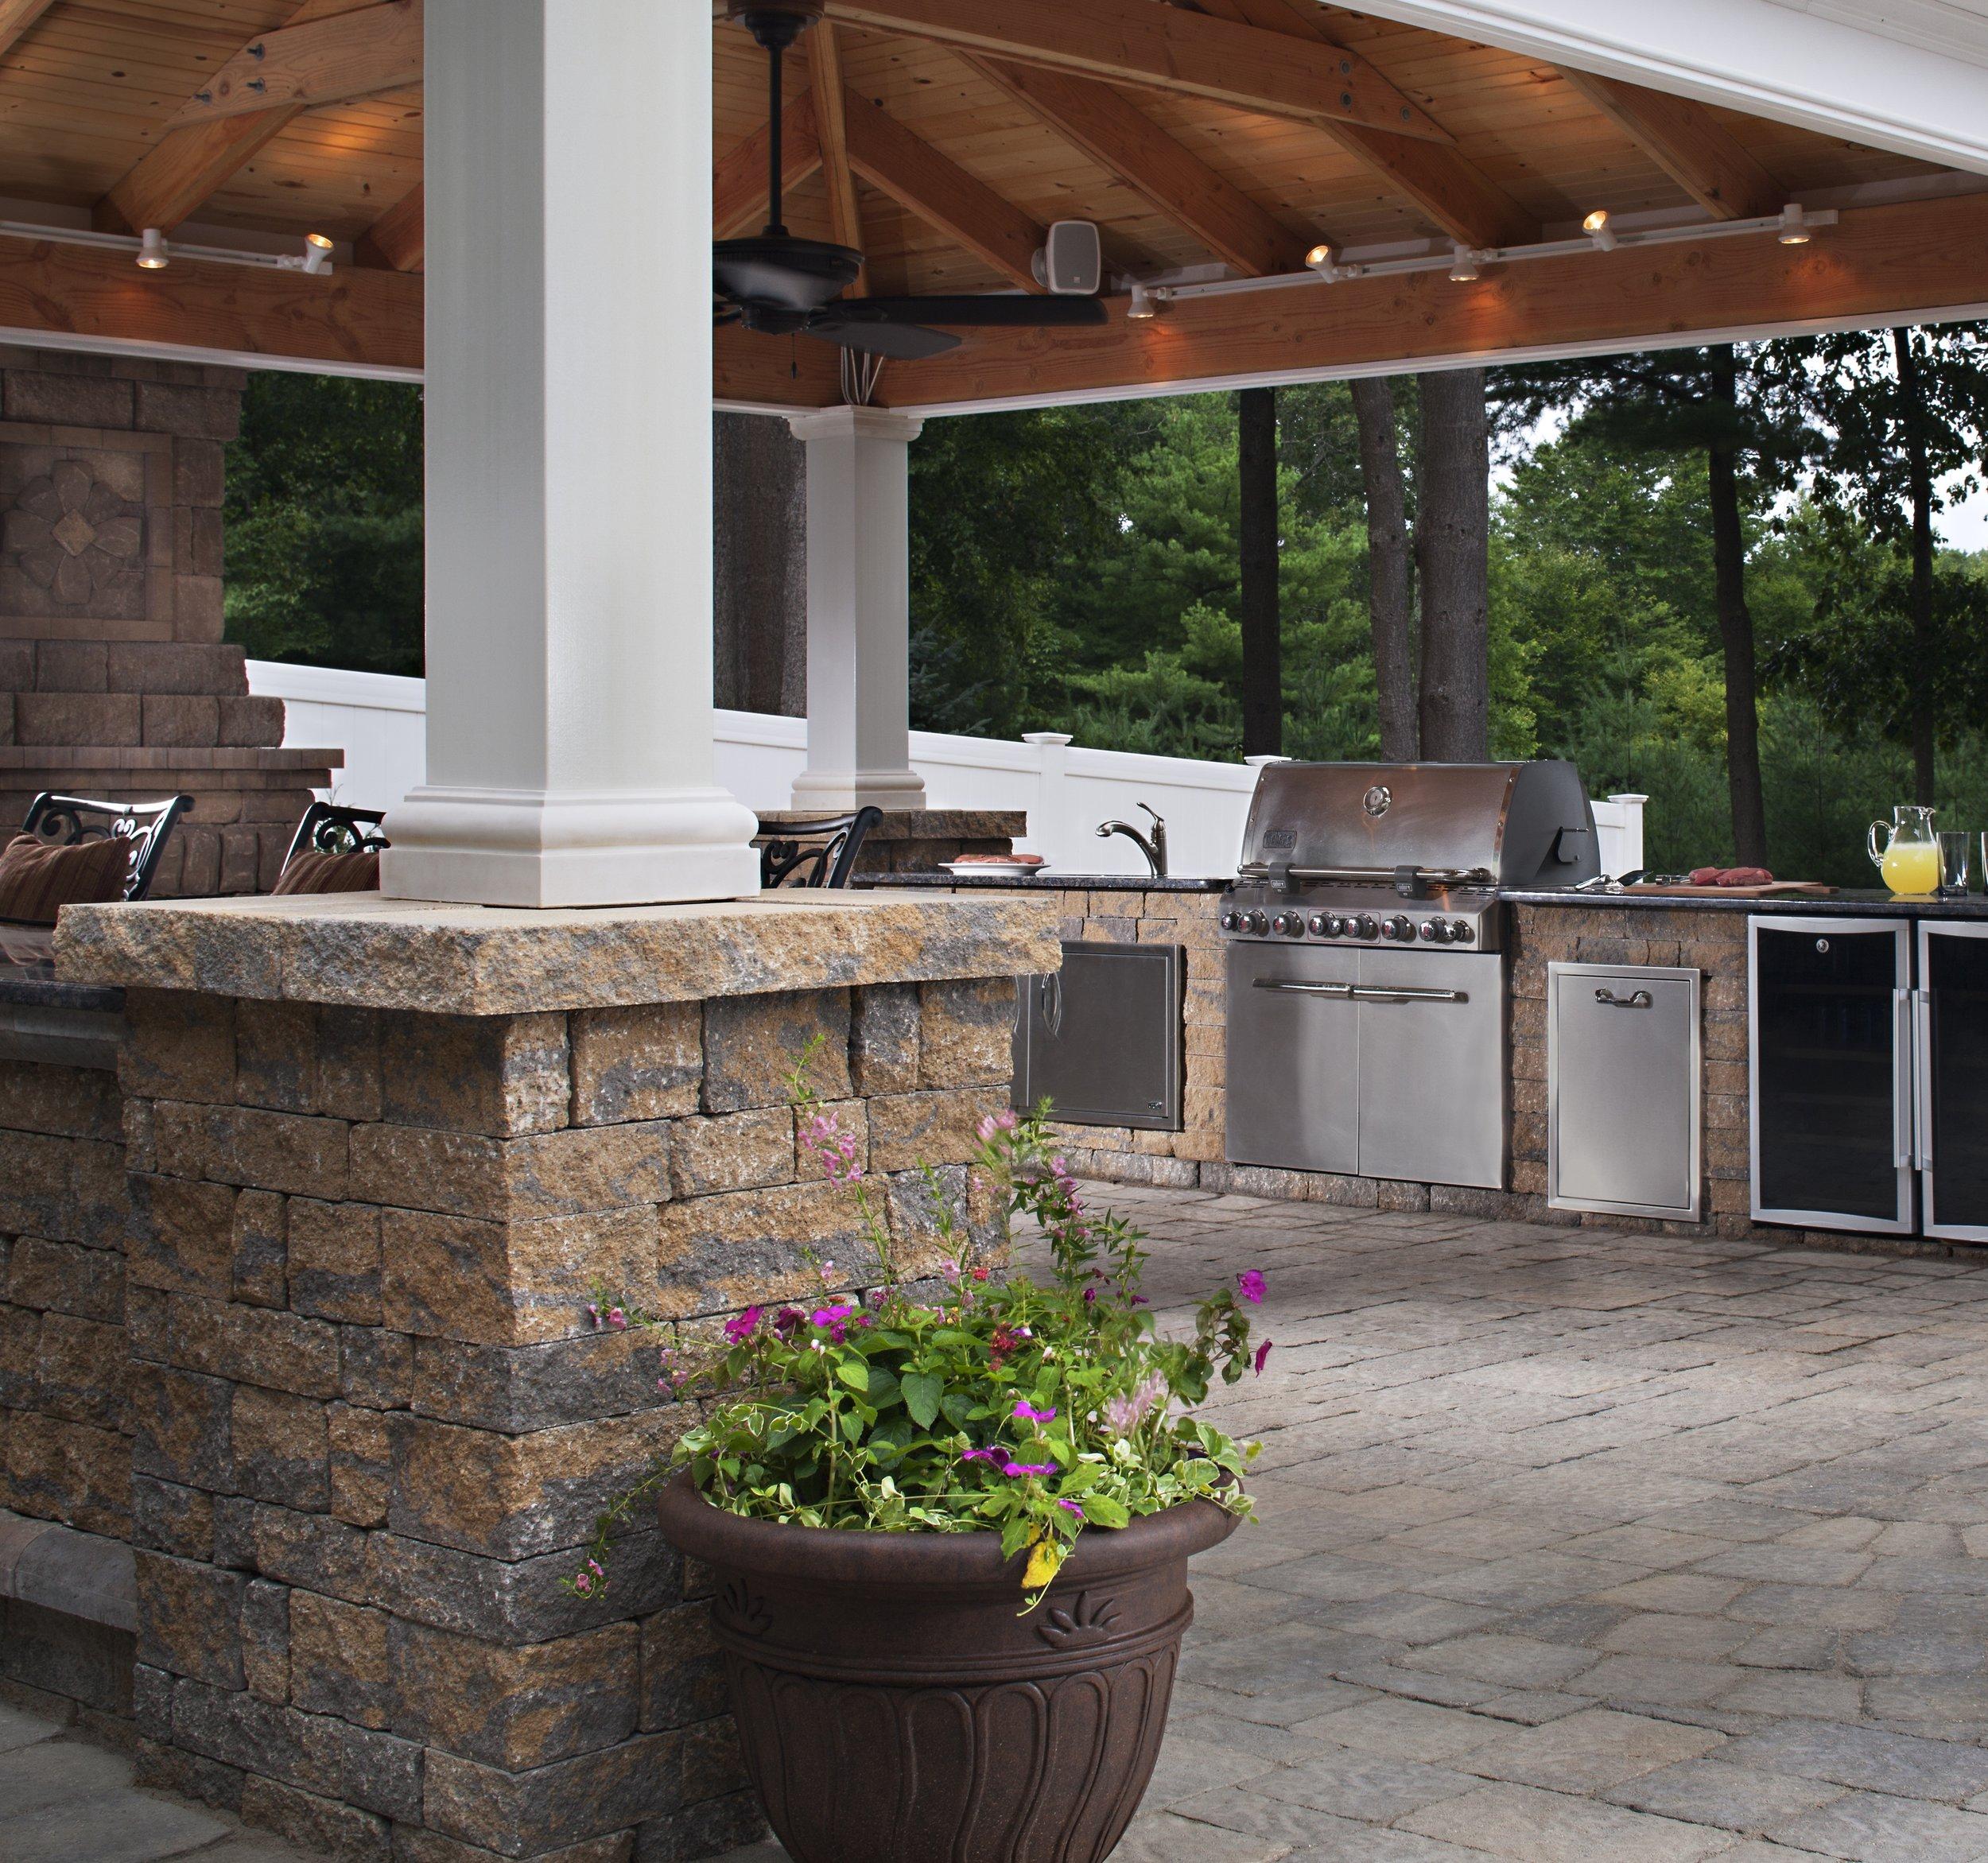 outdoor kitchen patio pavilion covered room landscape design lights backyard bbq dining